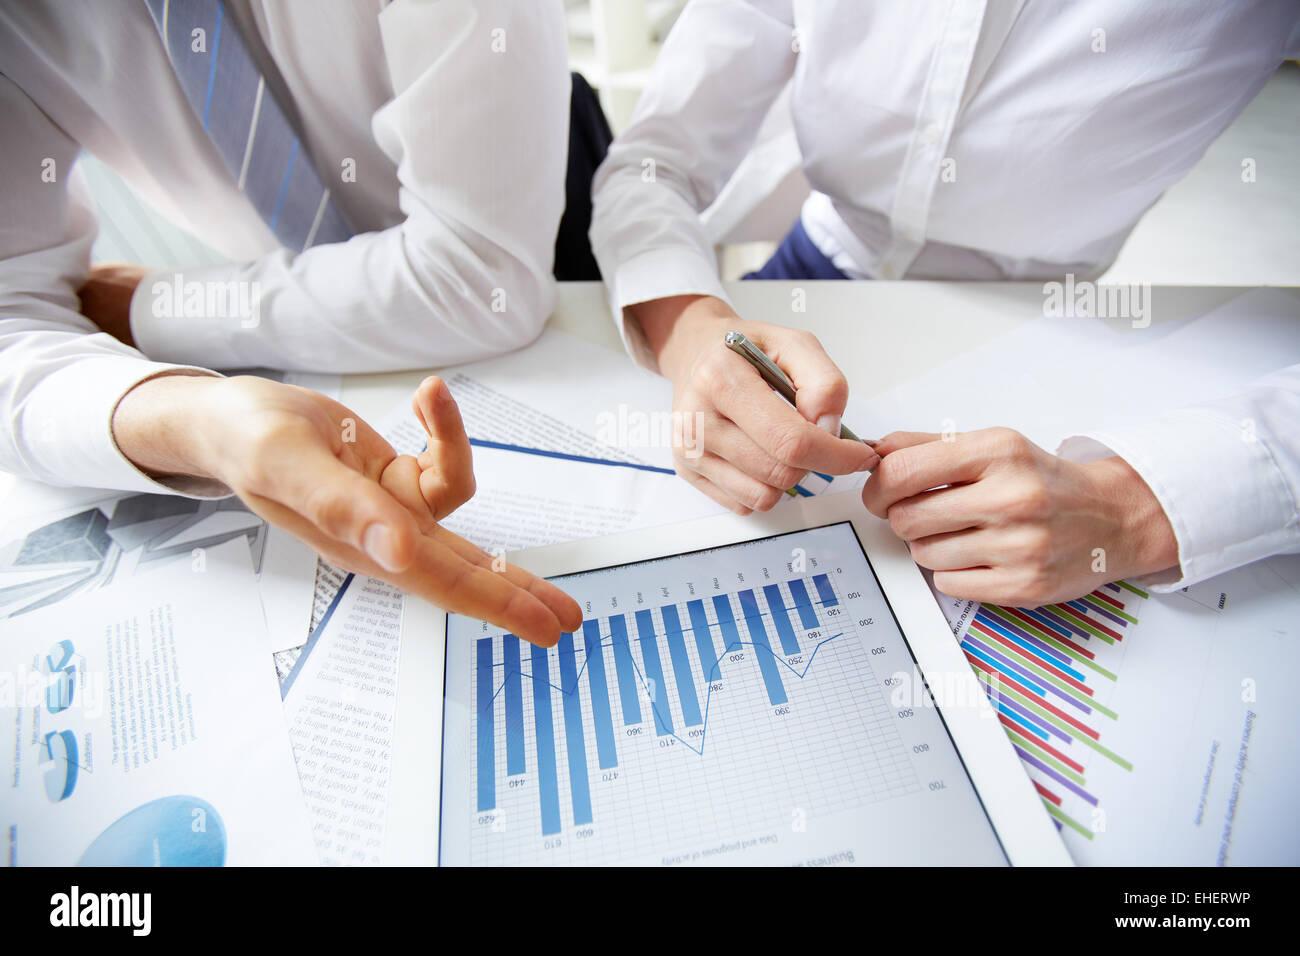 Businesspeople analyzing statistics - Stock Image